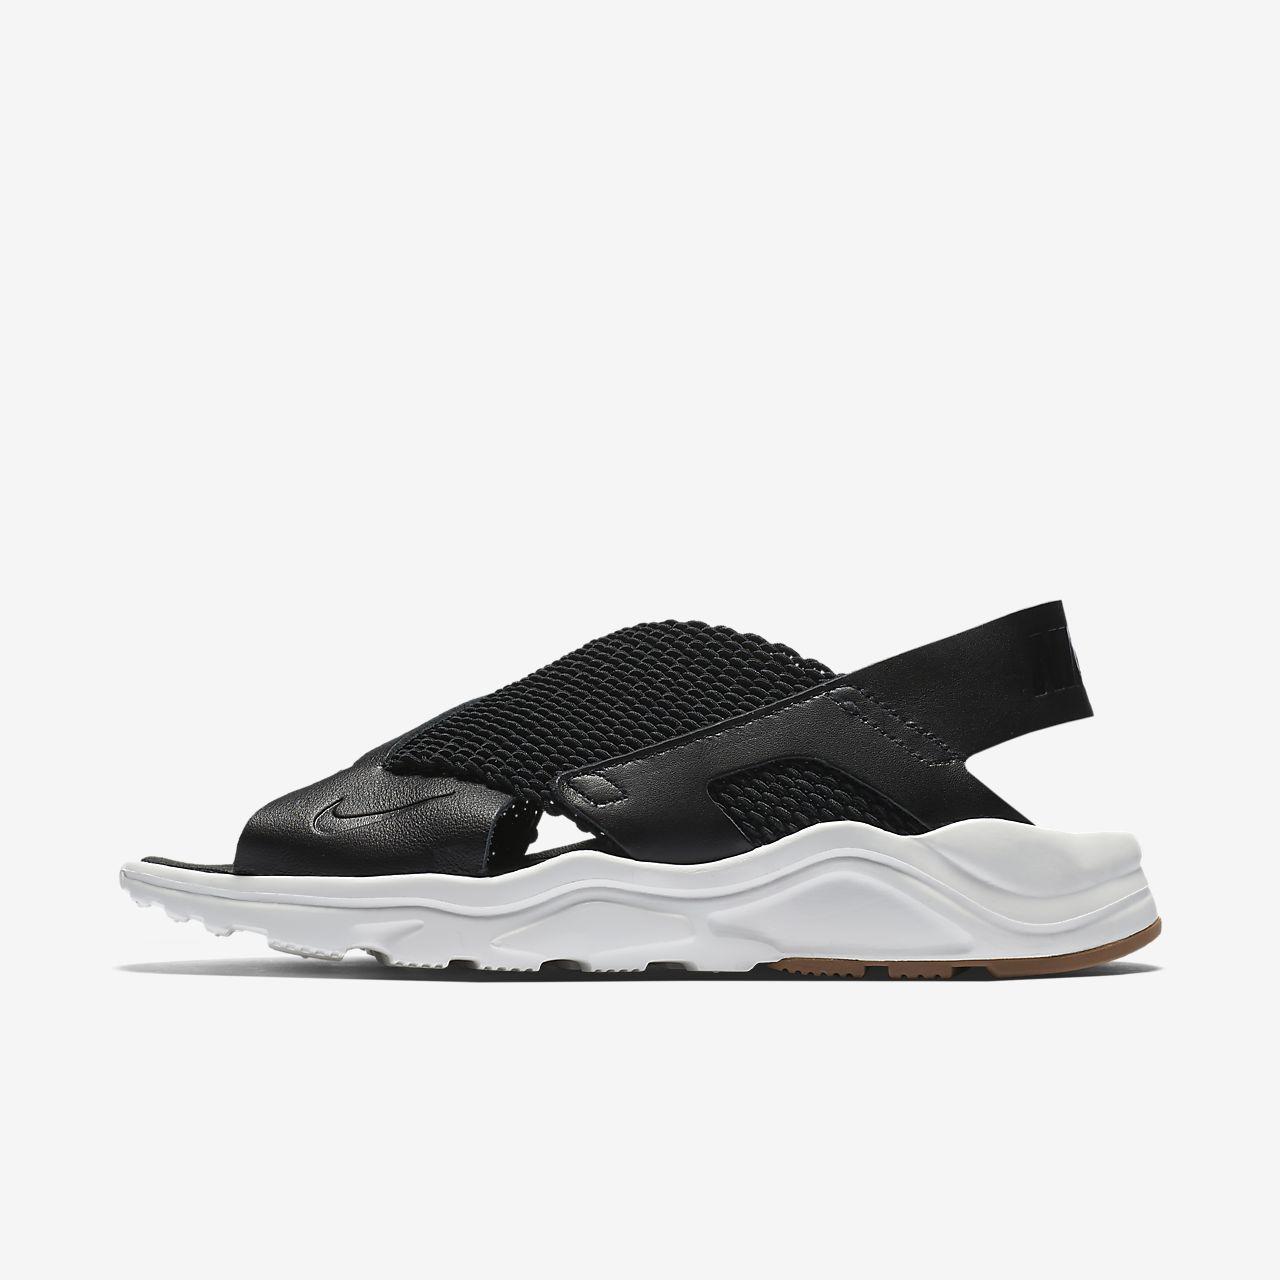 d4939f5ca99 Nike Air Huarache Ultra Women s Sandal